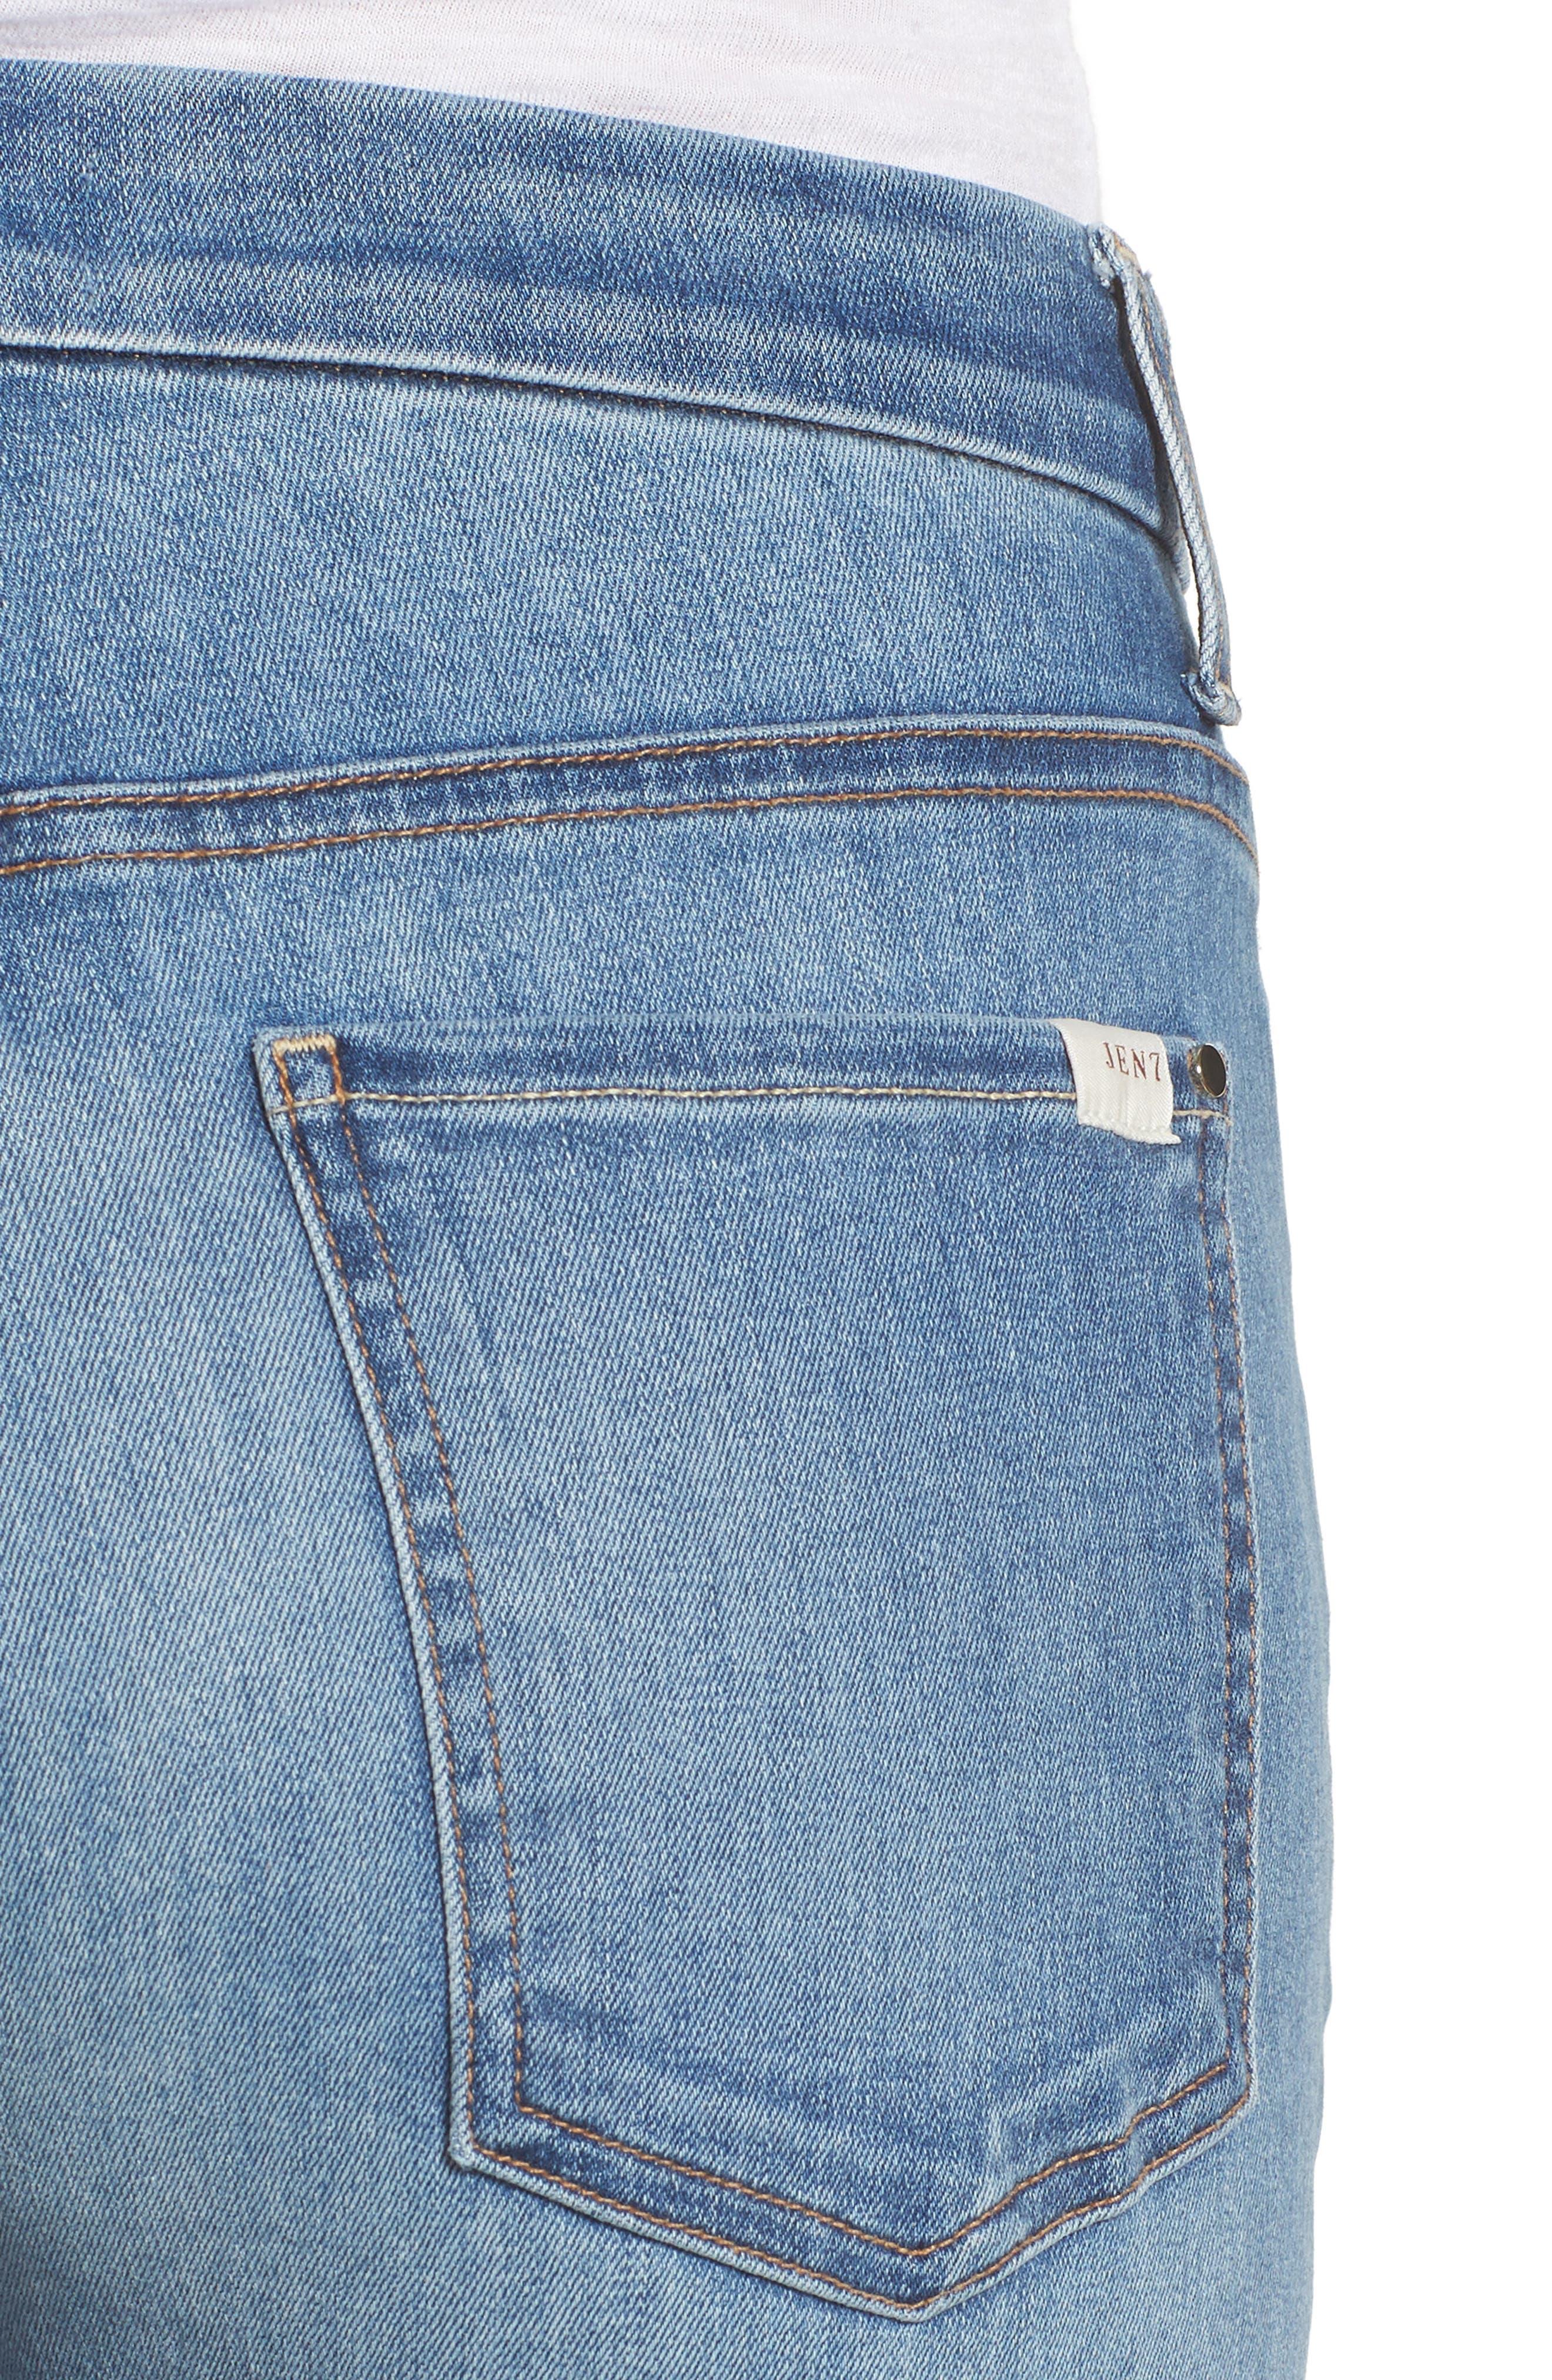 Slim Boyfriend Jeans,                             Alternate thumbnail 4, color,                             Sunlight